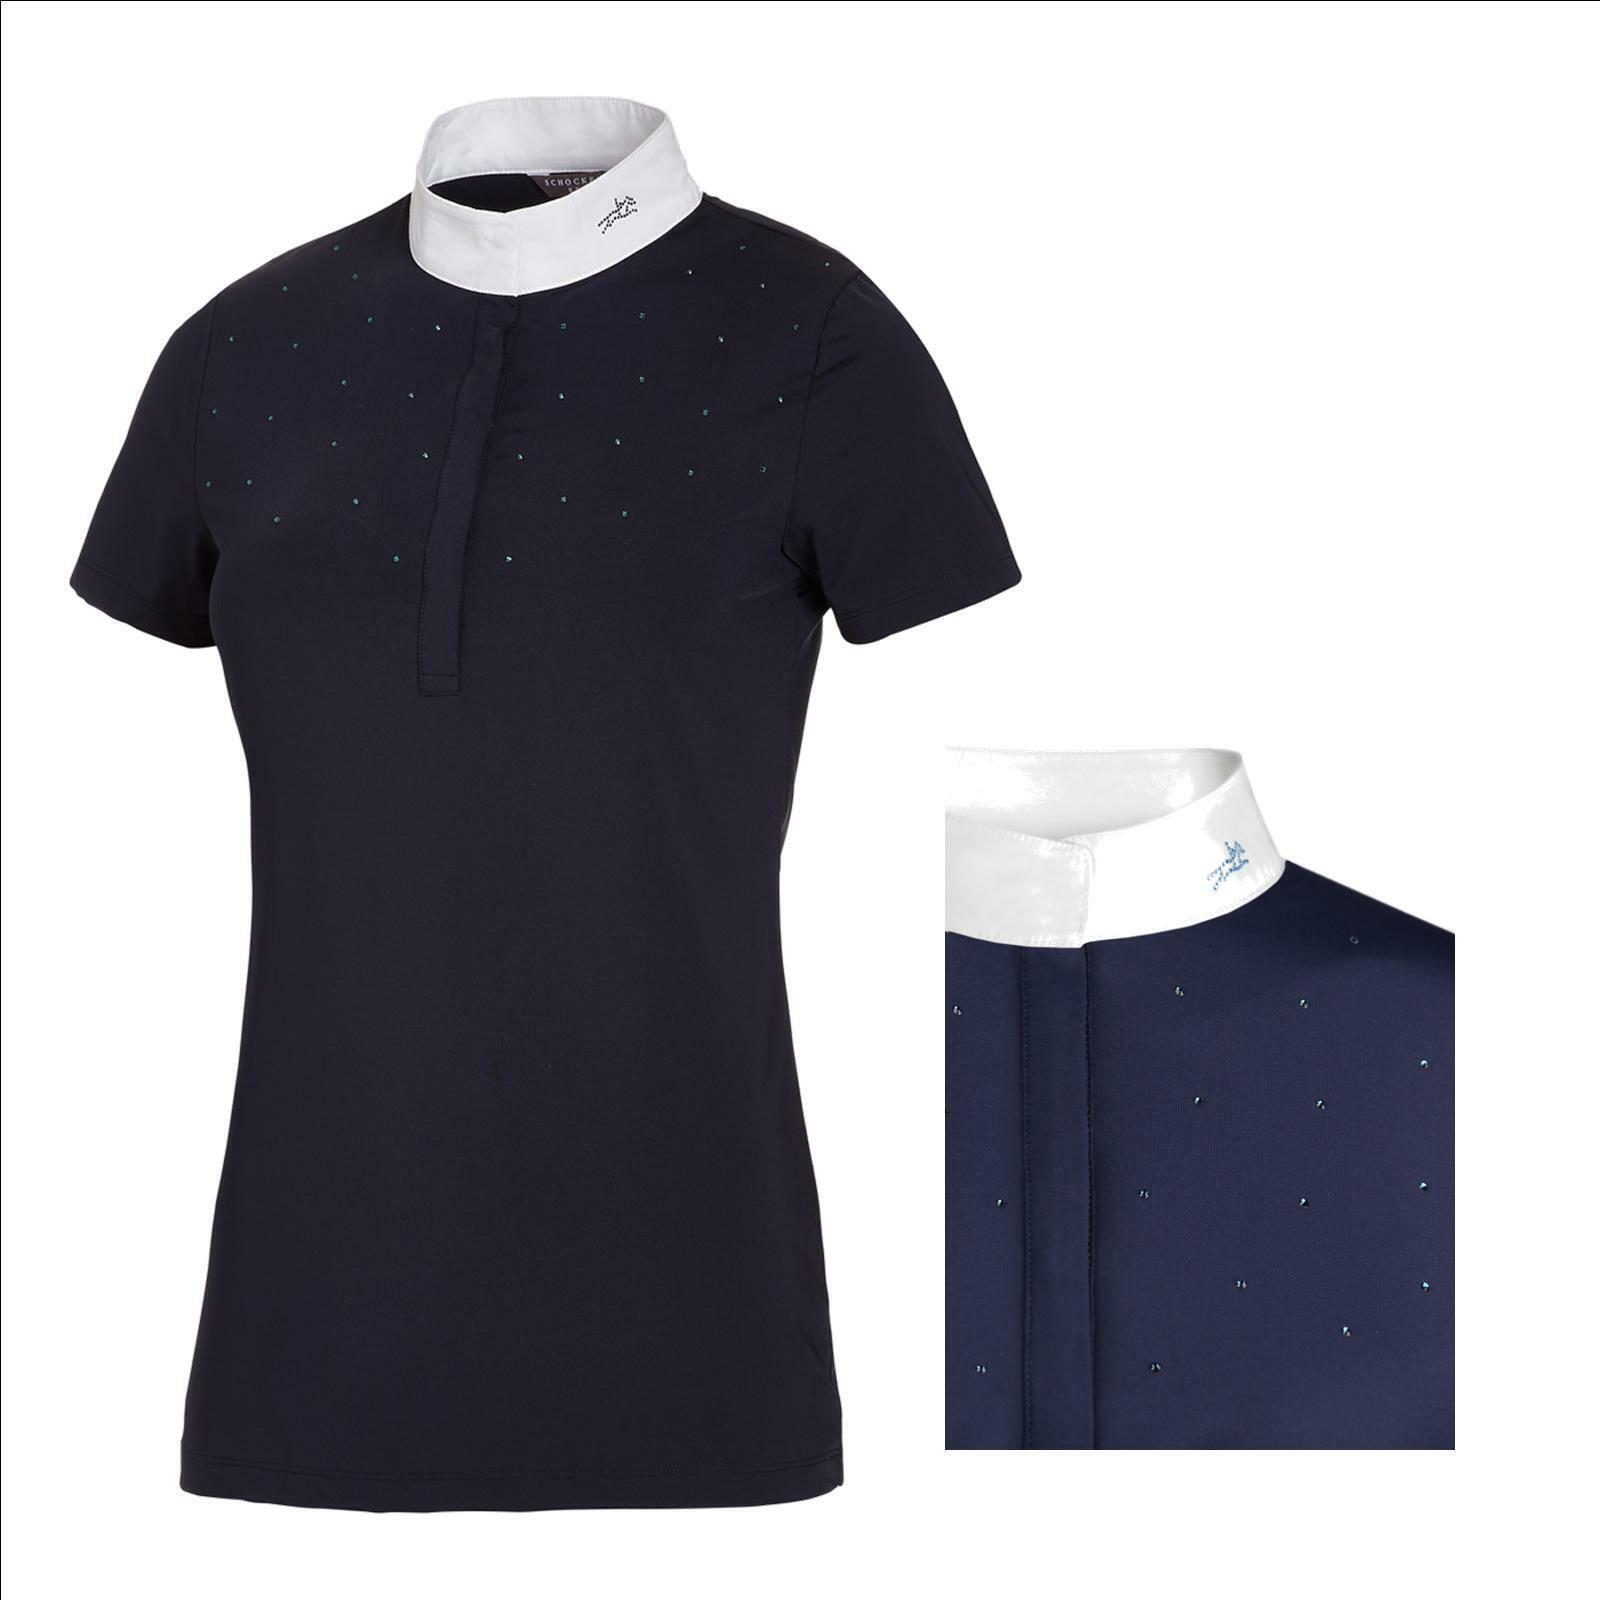 Schockemöhle torneo Shirt  Charlet-style  show camisa, señora camisa torneo